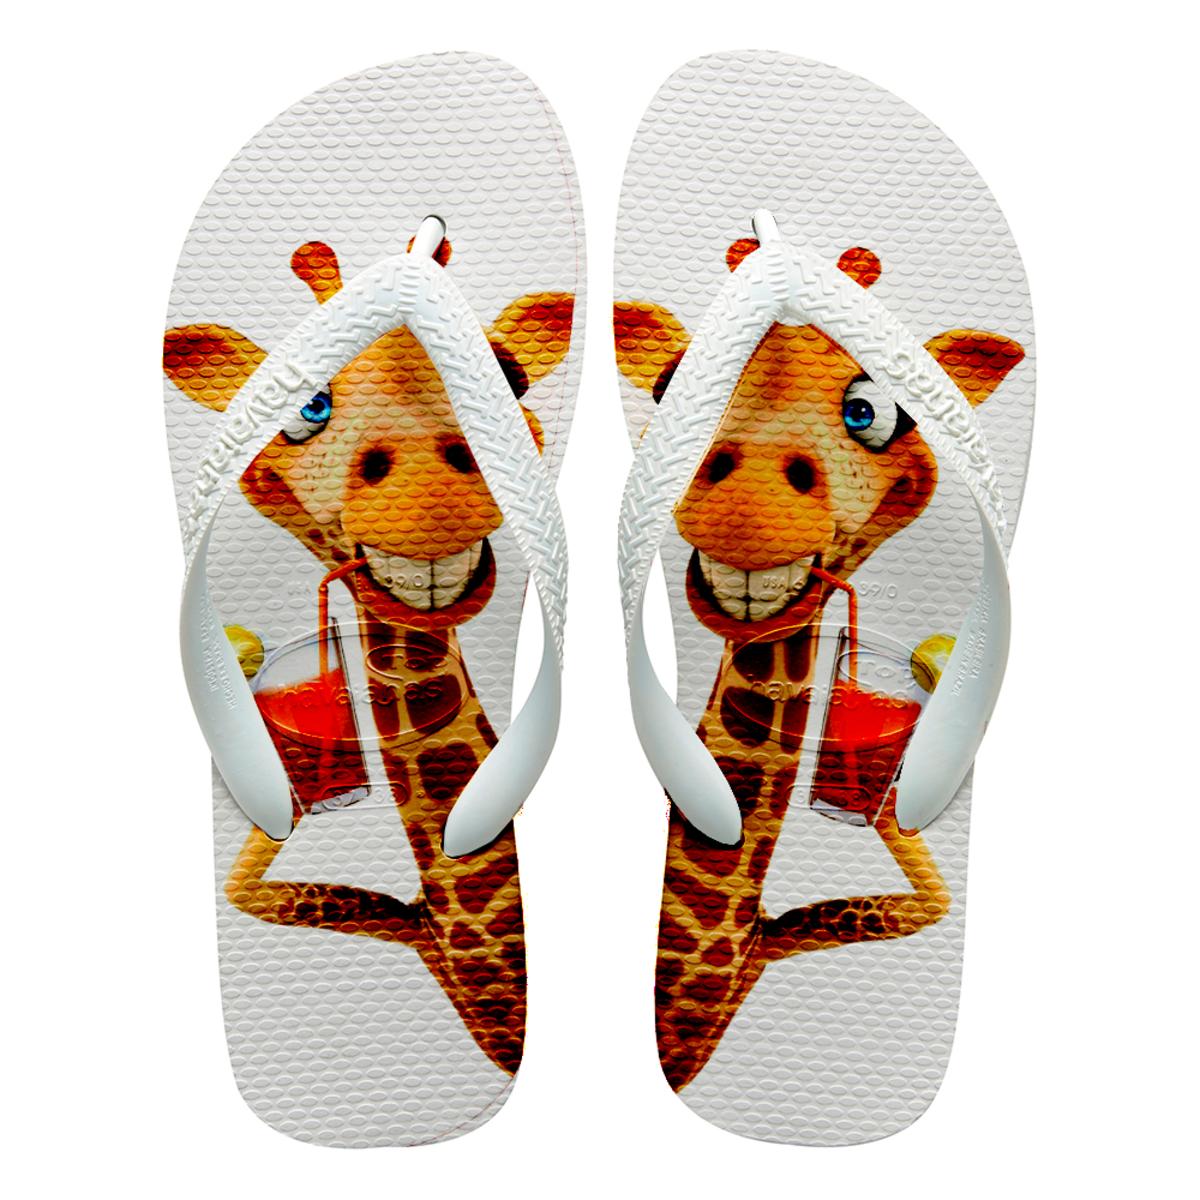 d2e58e7605 Chinelos havaianas personalizado girafa no Elo7